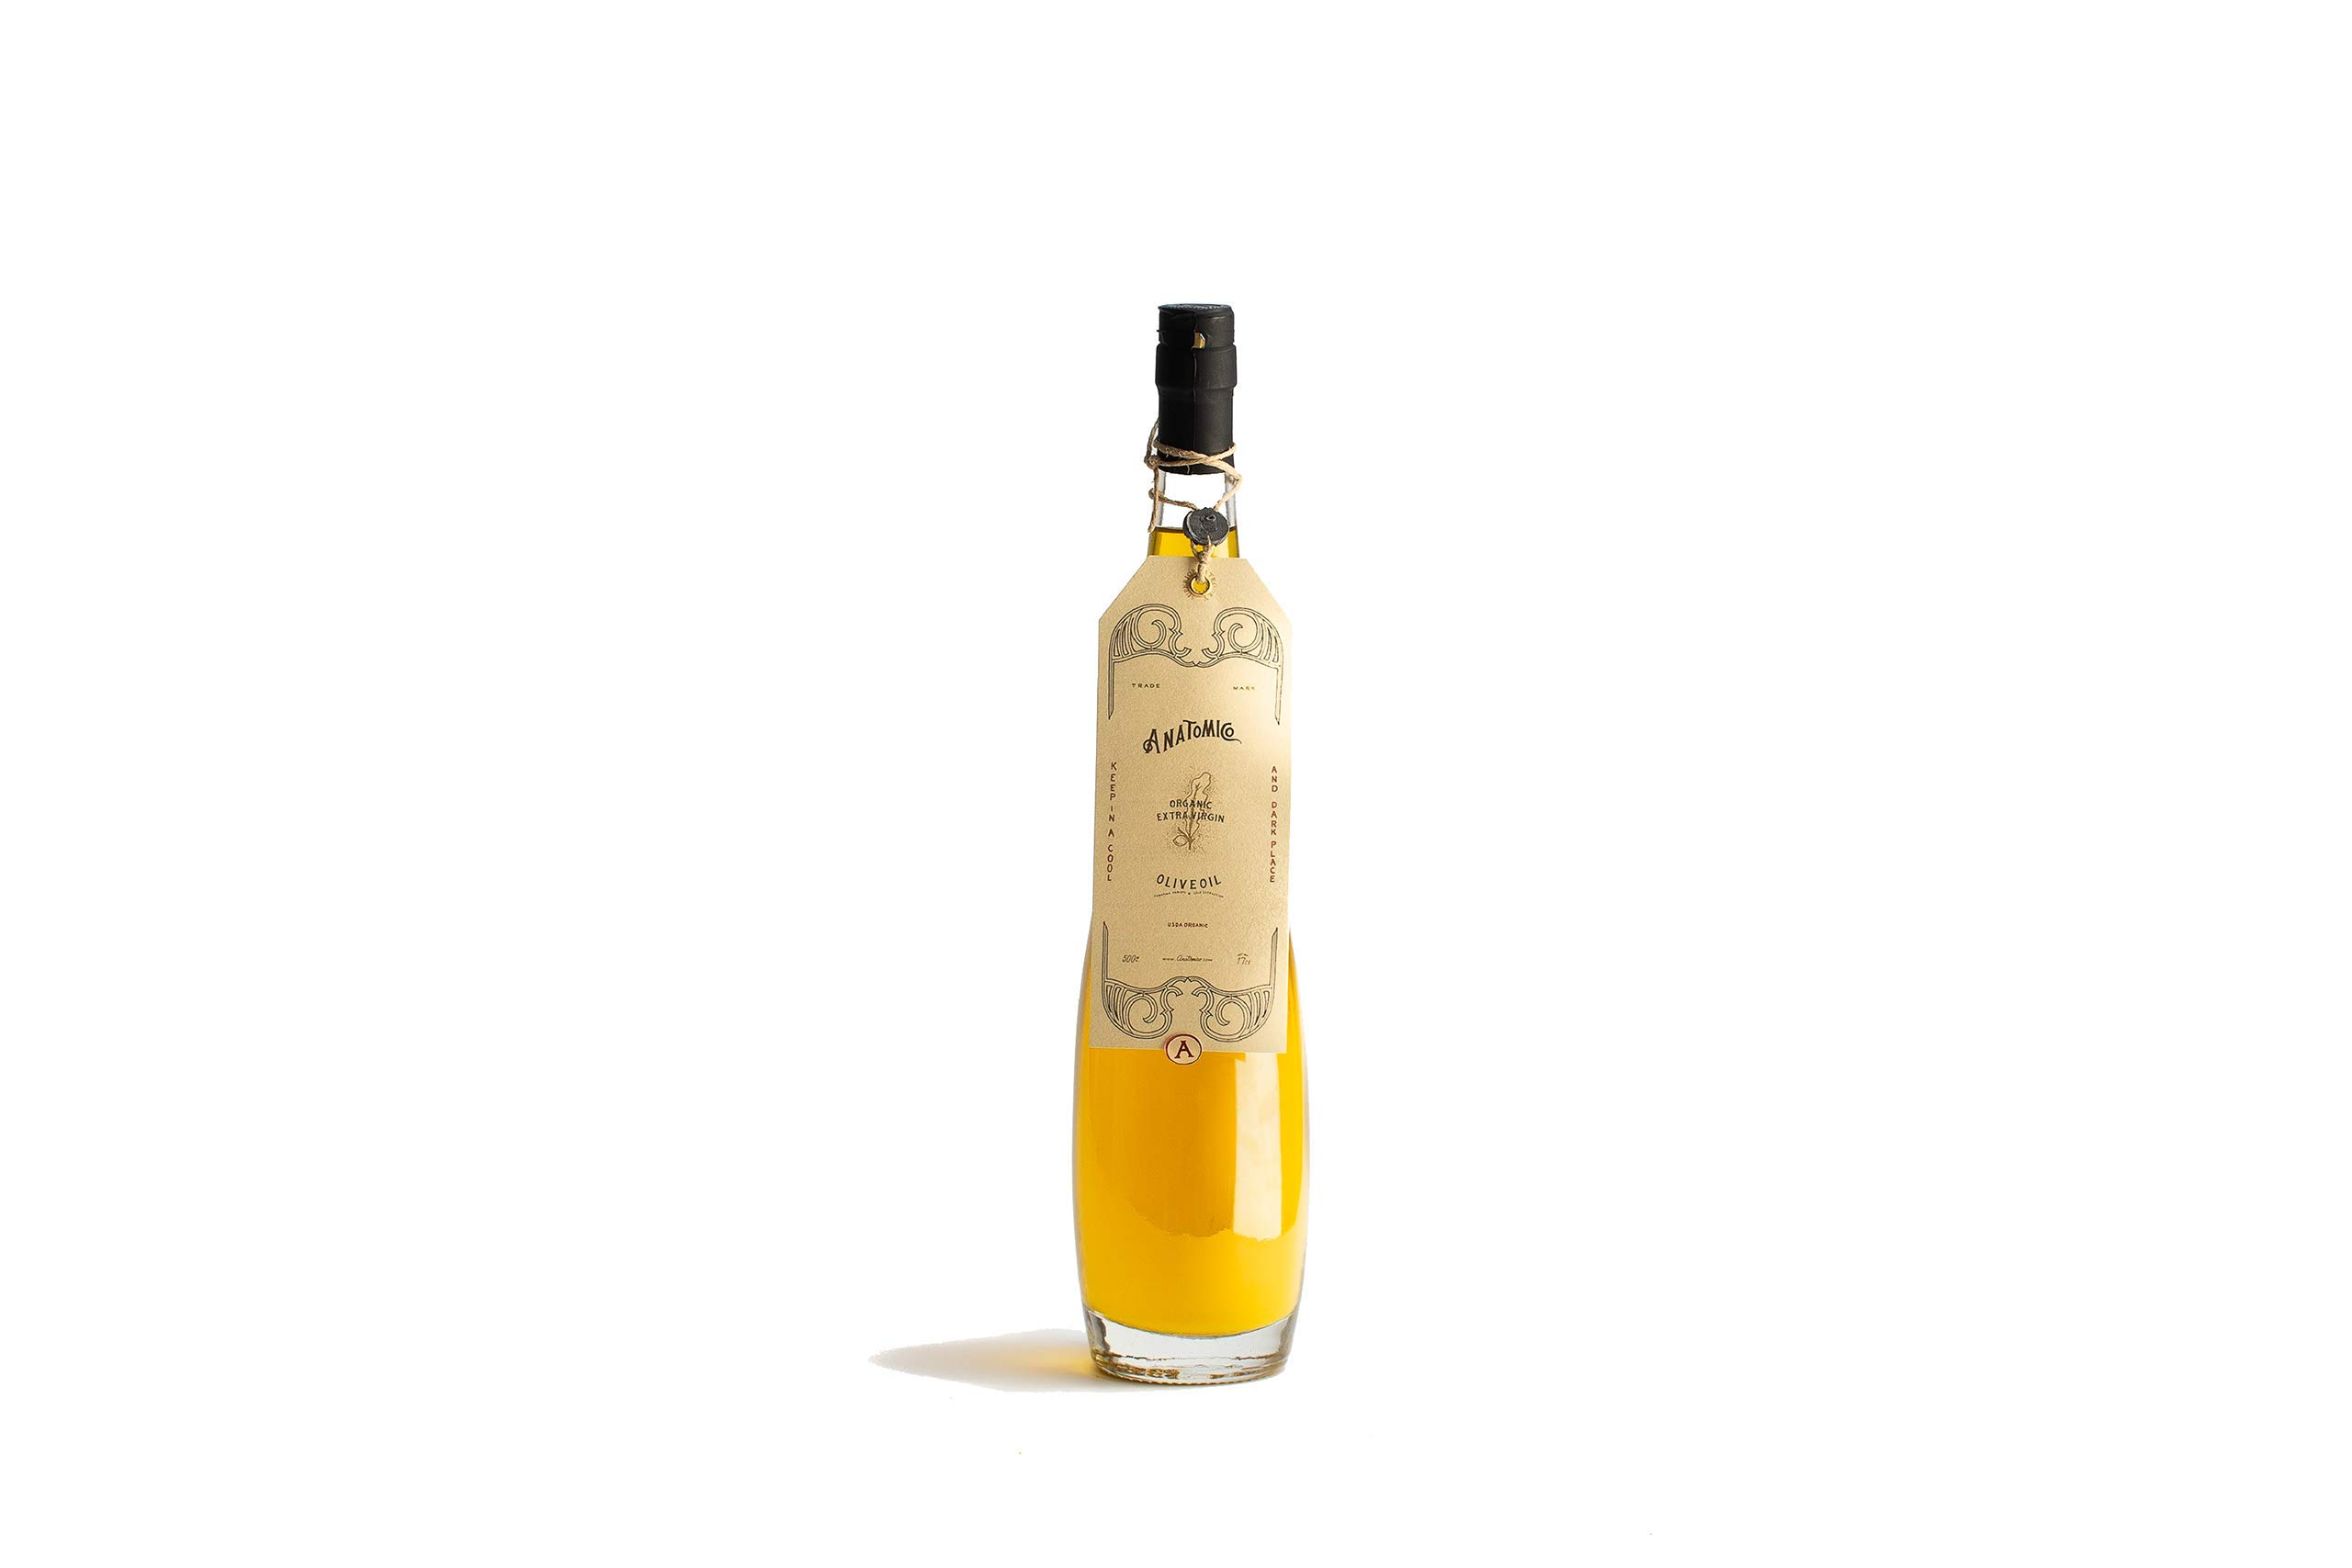 Anatomico Organic Coratina Extra Virgin Olive Oil, Made in Puglia Italy, 16.9 FL Oz. (500 ml)